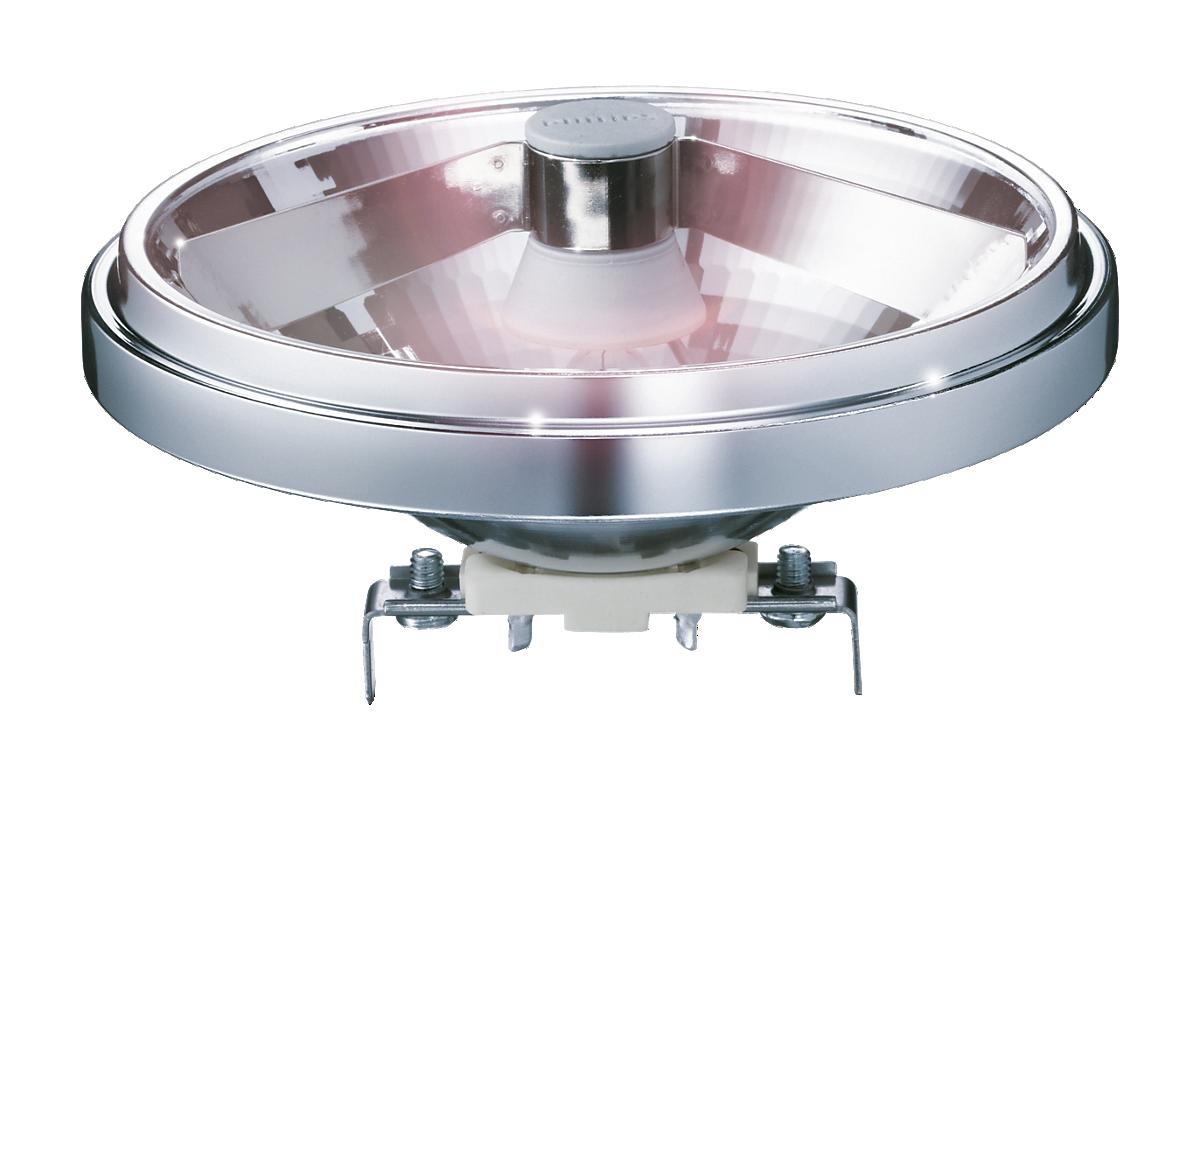 Masterline 111 Lv Halogen With Reflector Philips